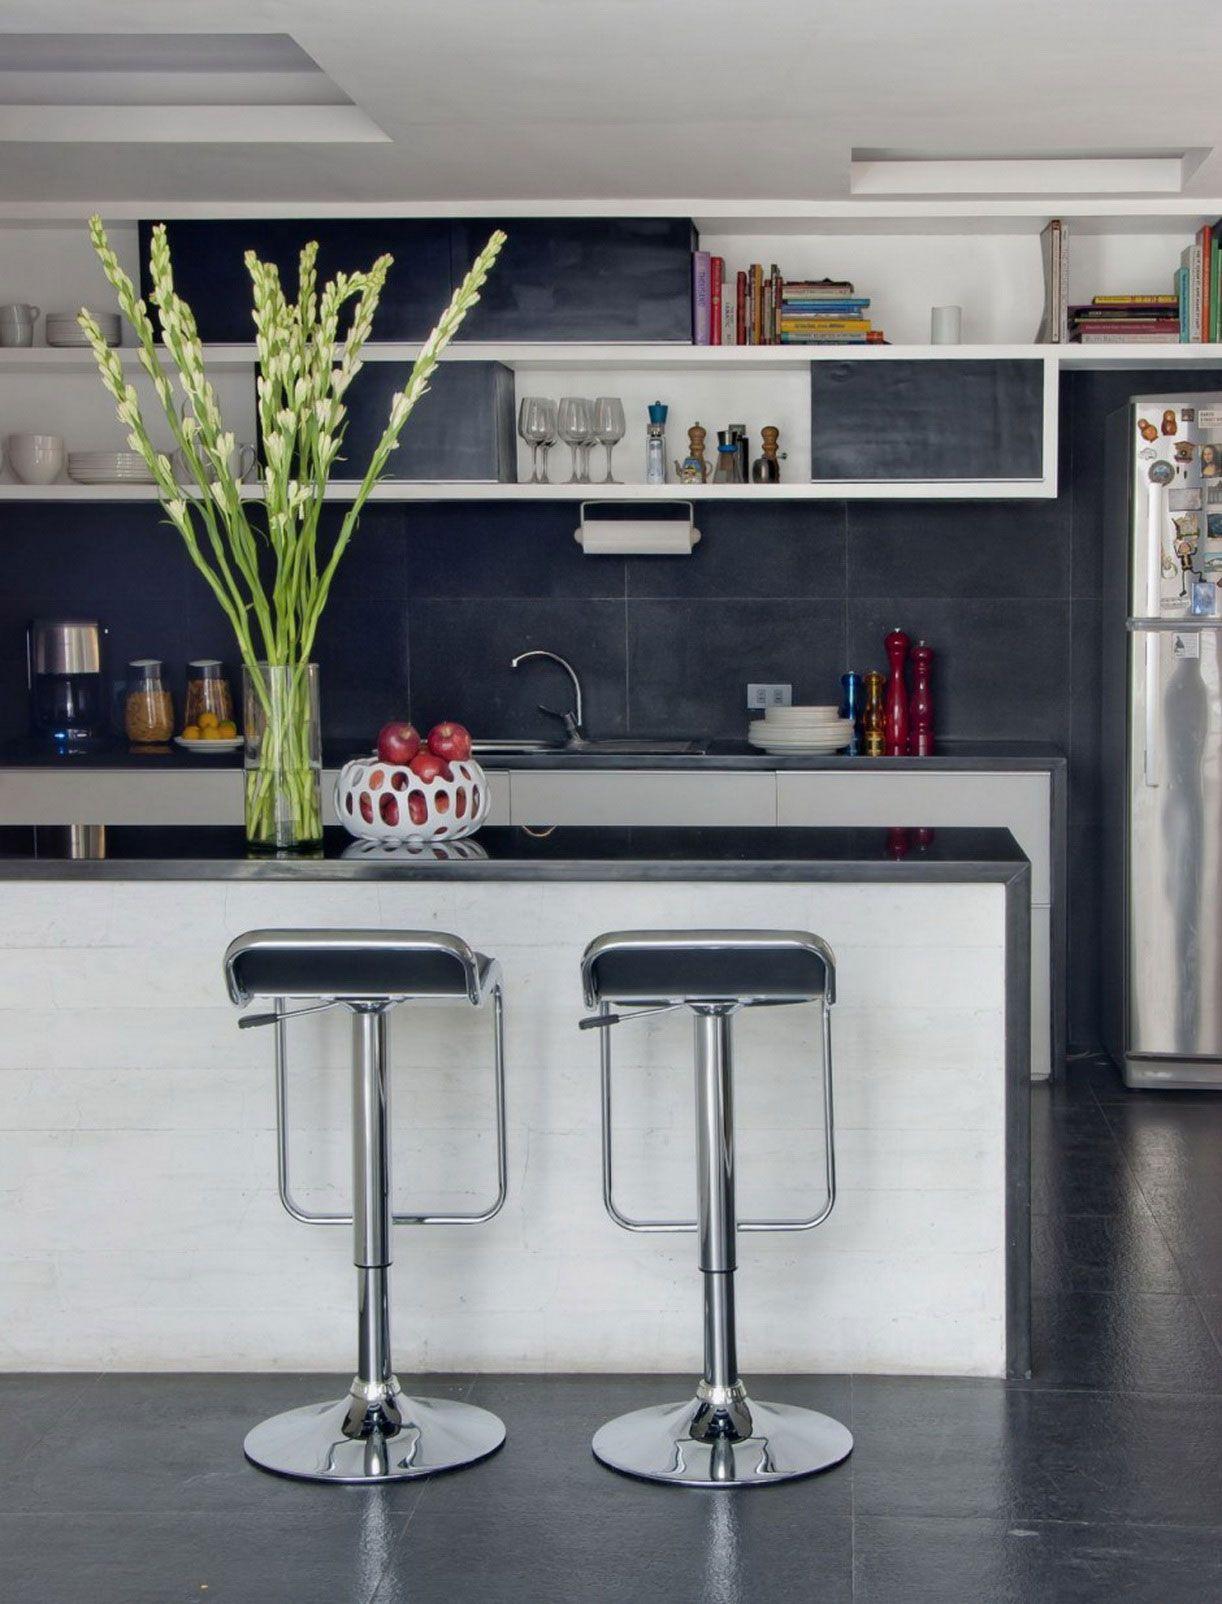 Home Design And Interior Design Gallery Of Basement Minimalist Mini Bar  Ideas